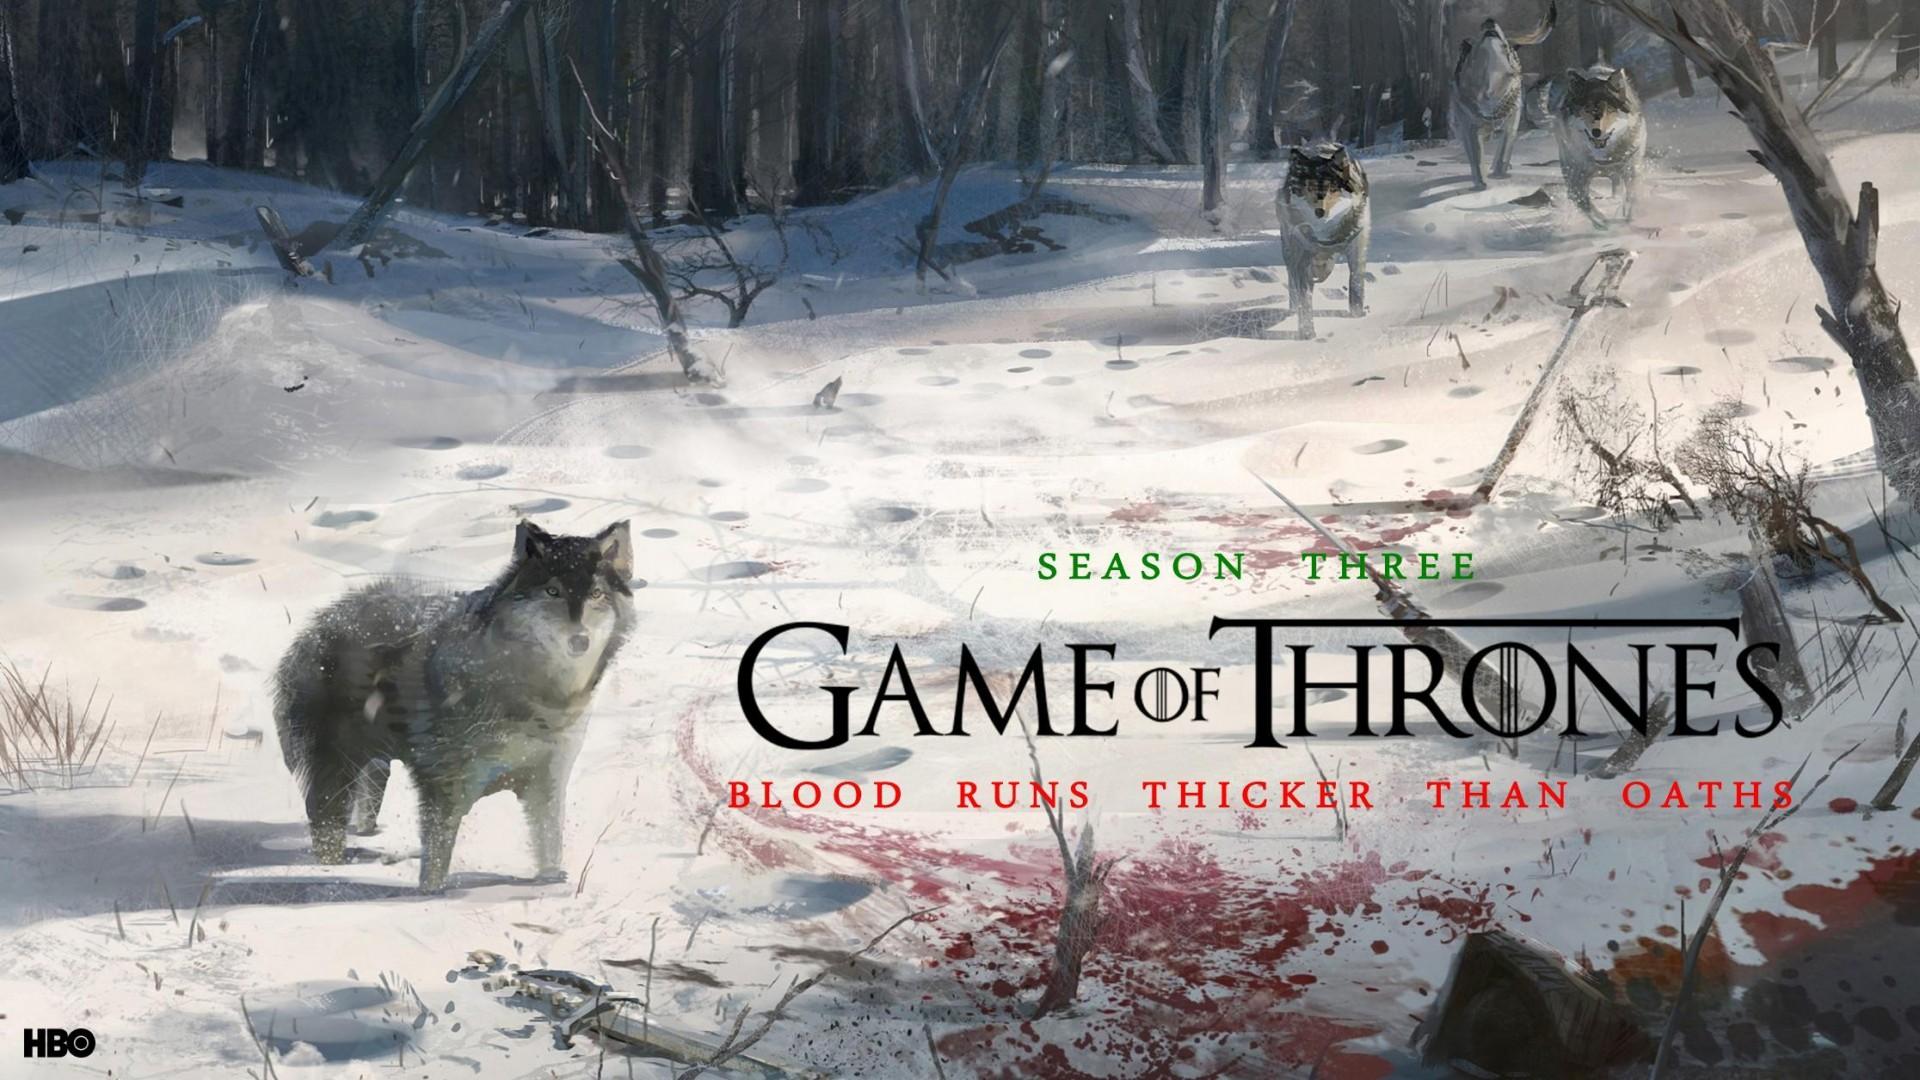 Download Season 3 Game Of Thrones Desktop HD Wallpaper 1920x1080